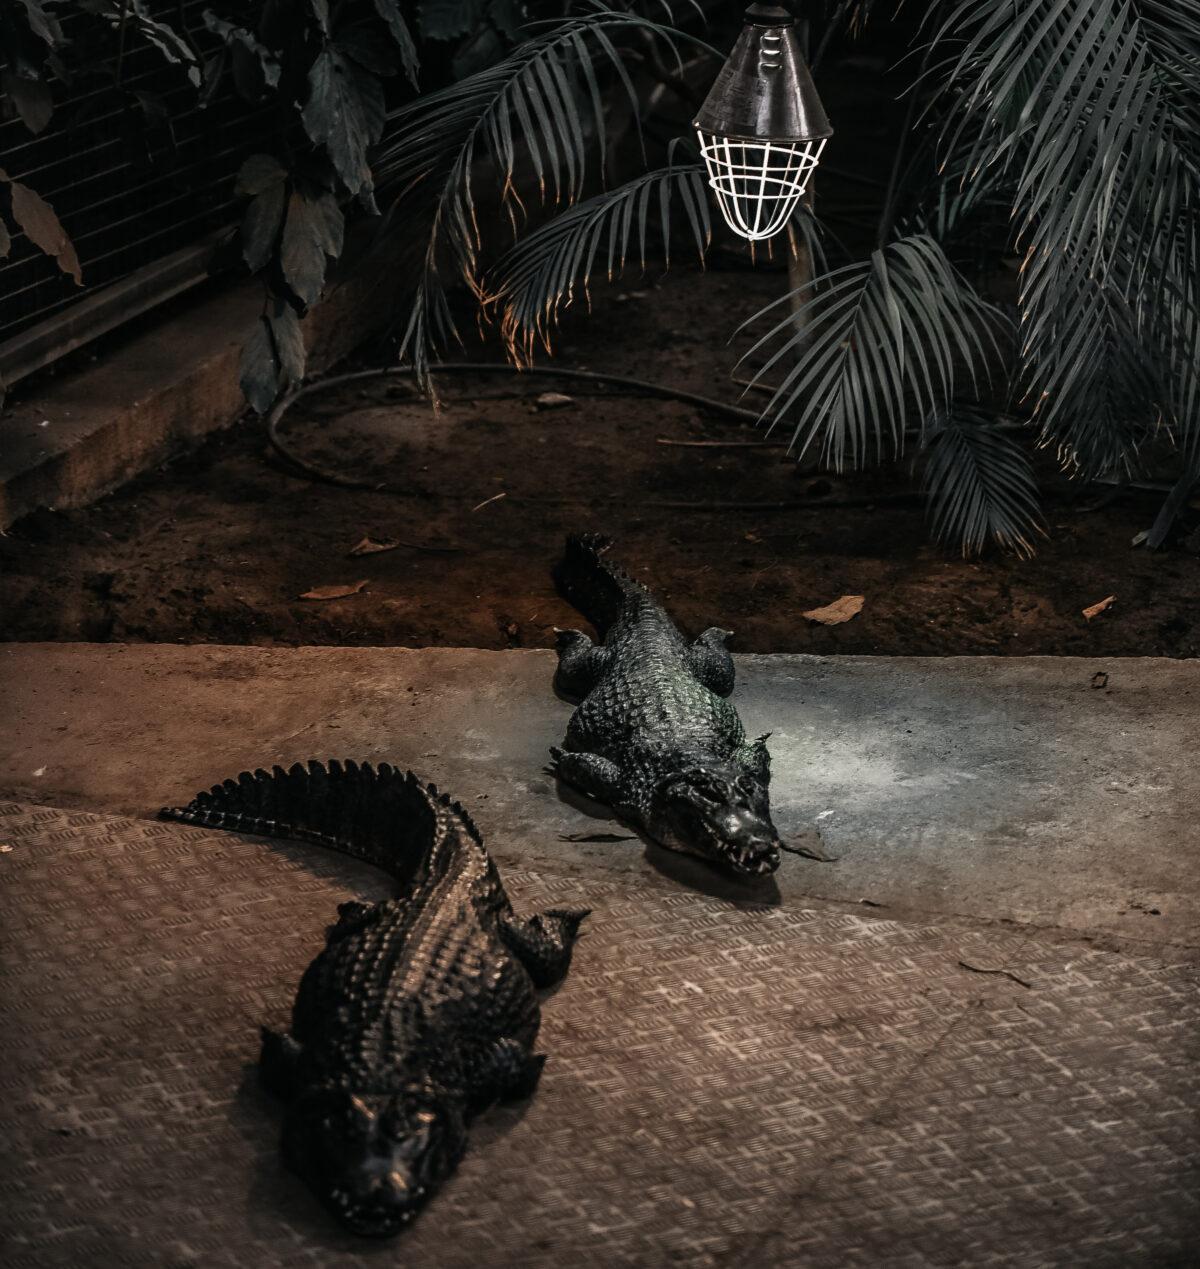 Florida Alligators | DREAMPORT DESIGN